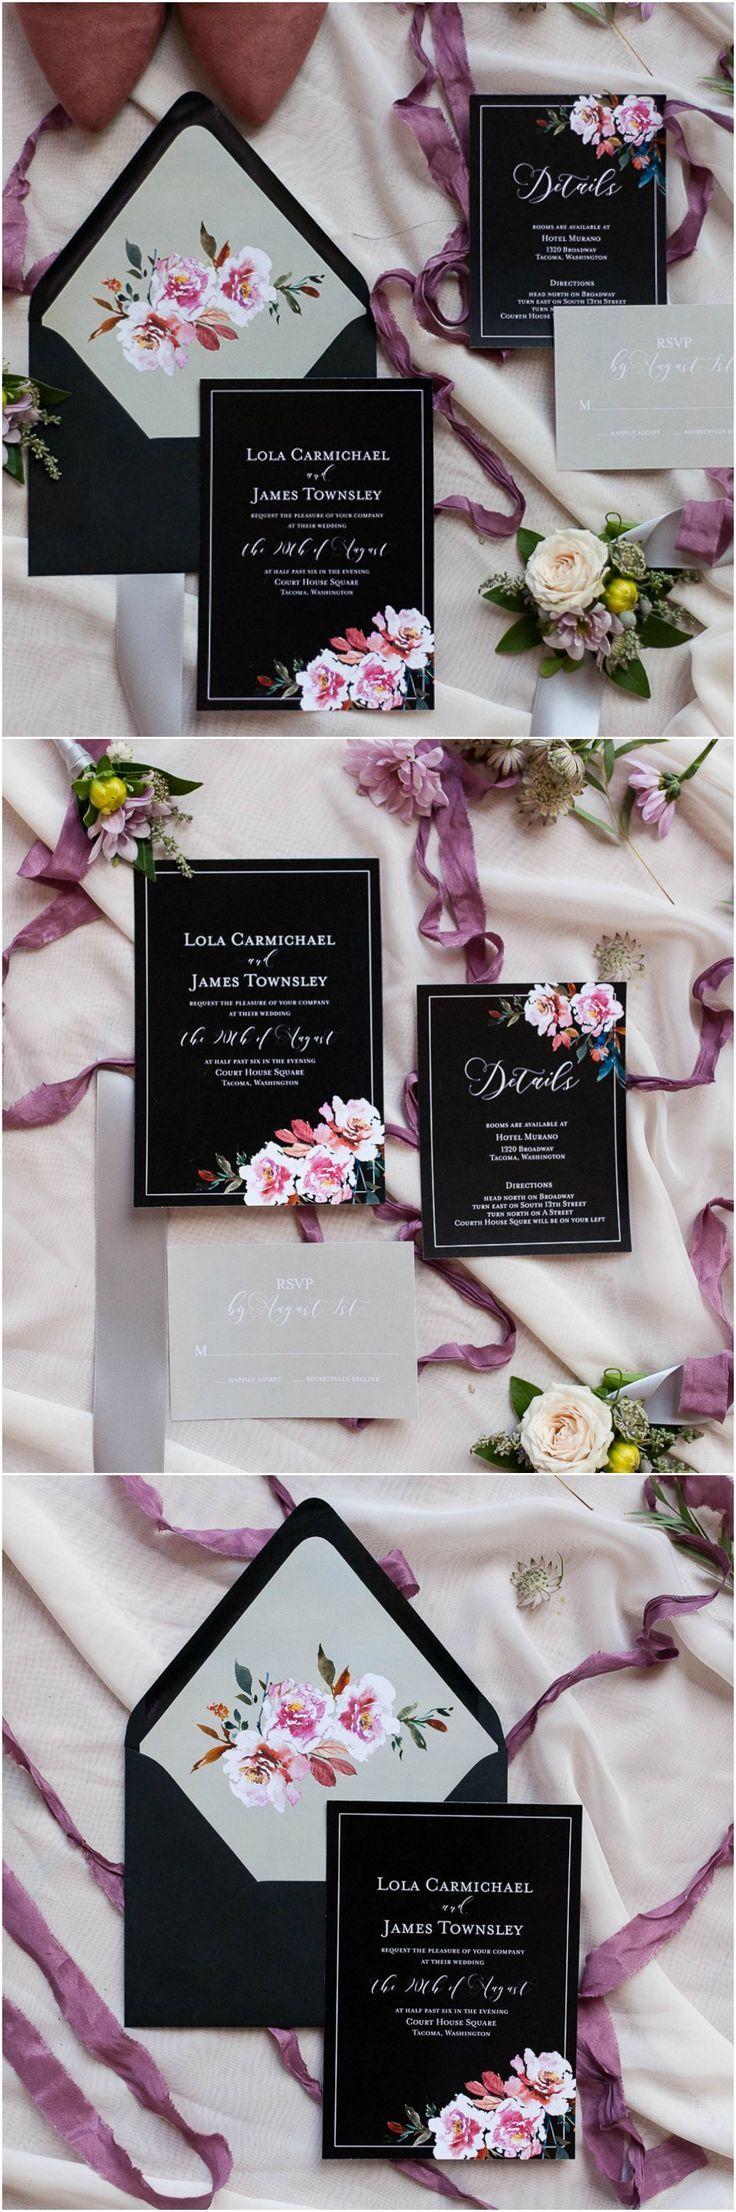 purple white silver wedding invitations%0A The Smarter Way to Wed  Wedding BlackPurple